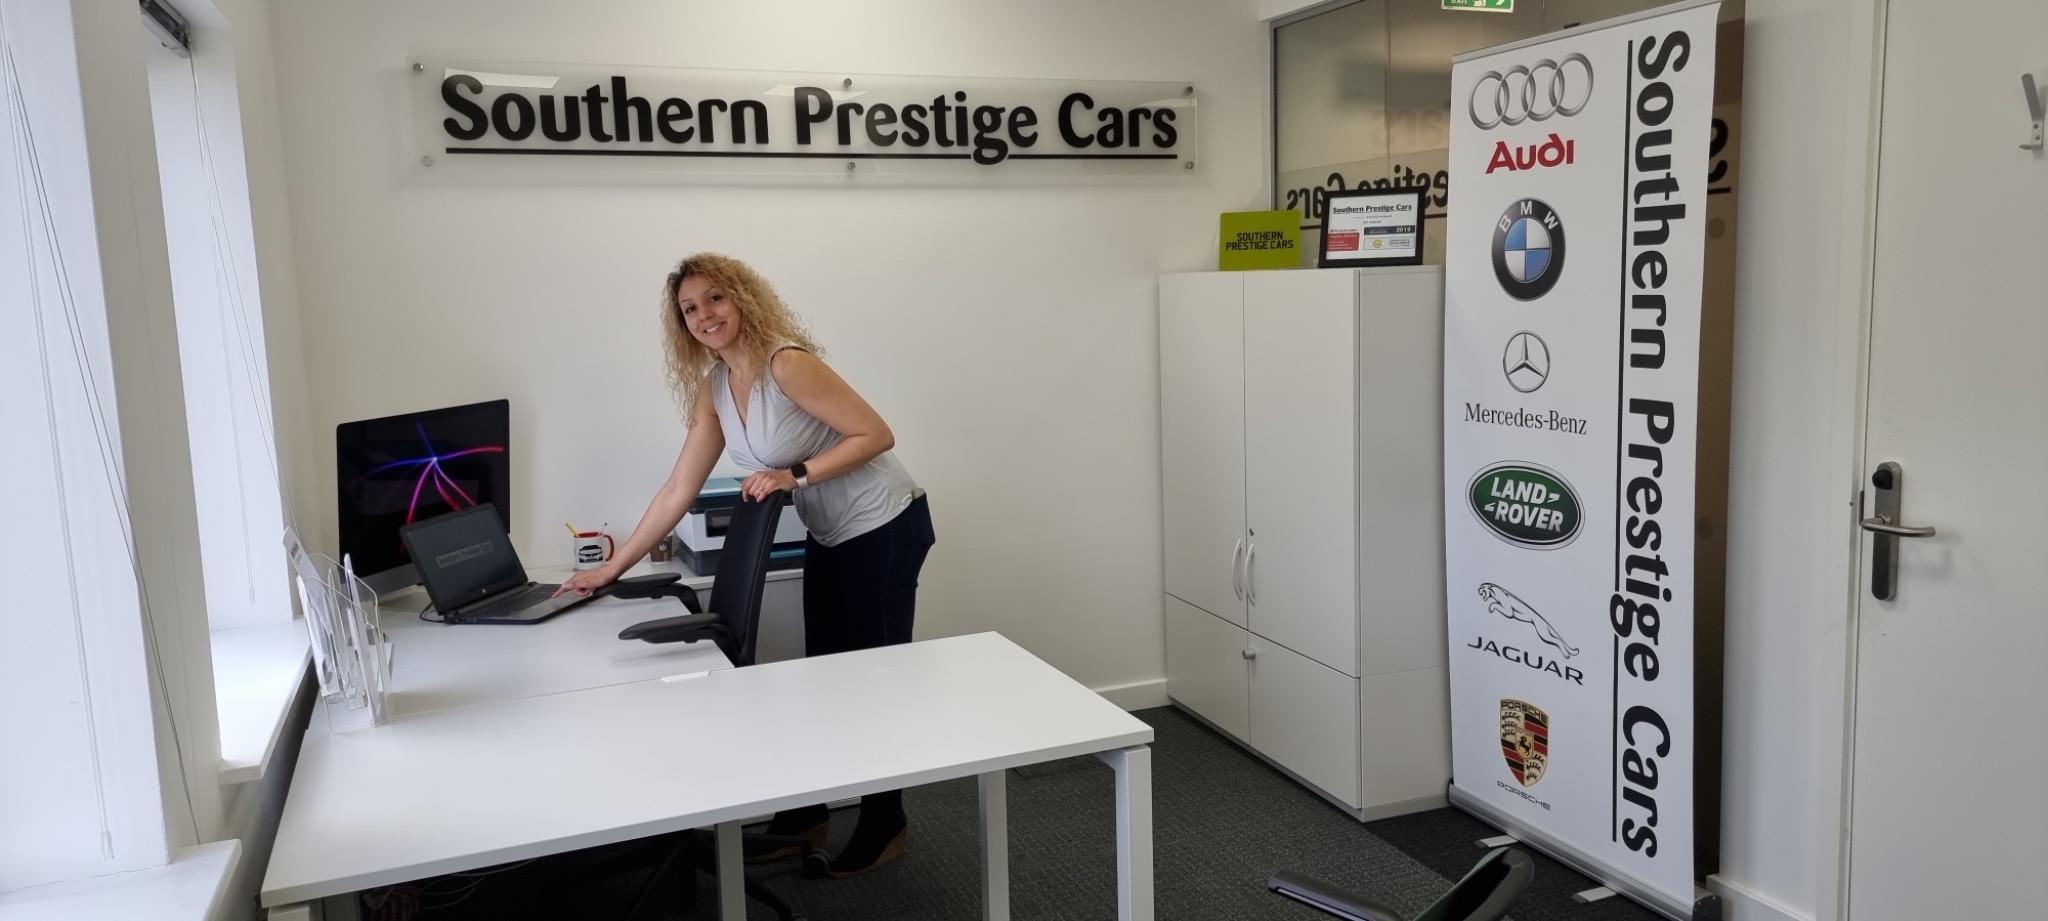 Southern Prestige Cars Bristol Car Dealership In Bristol Autotrader